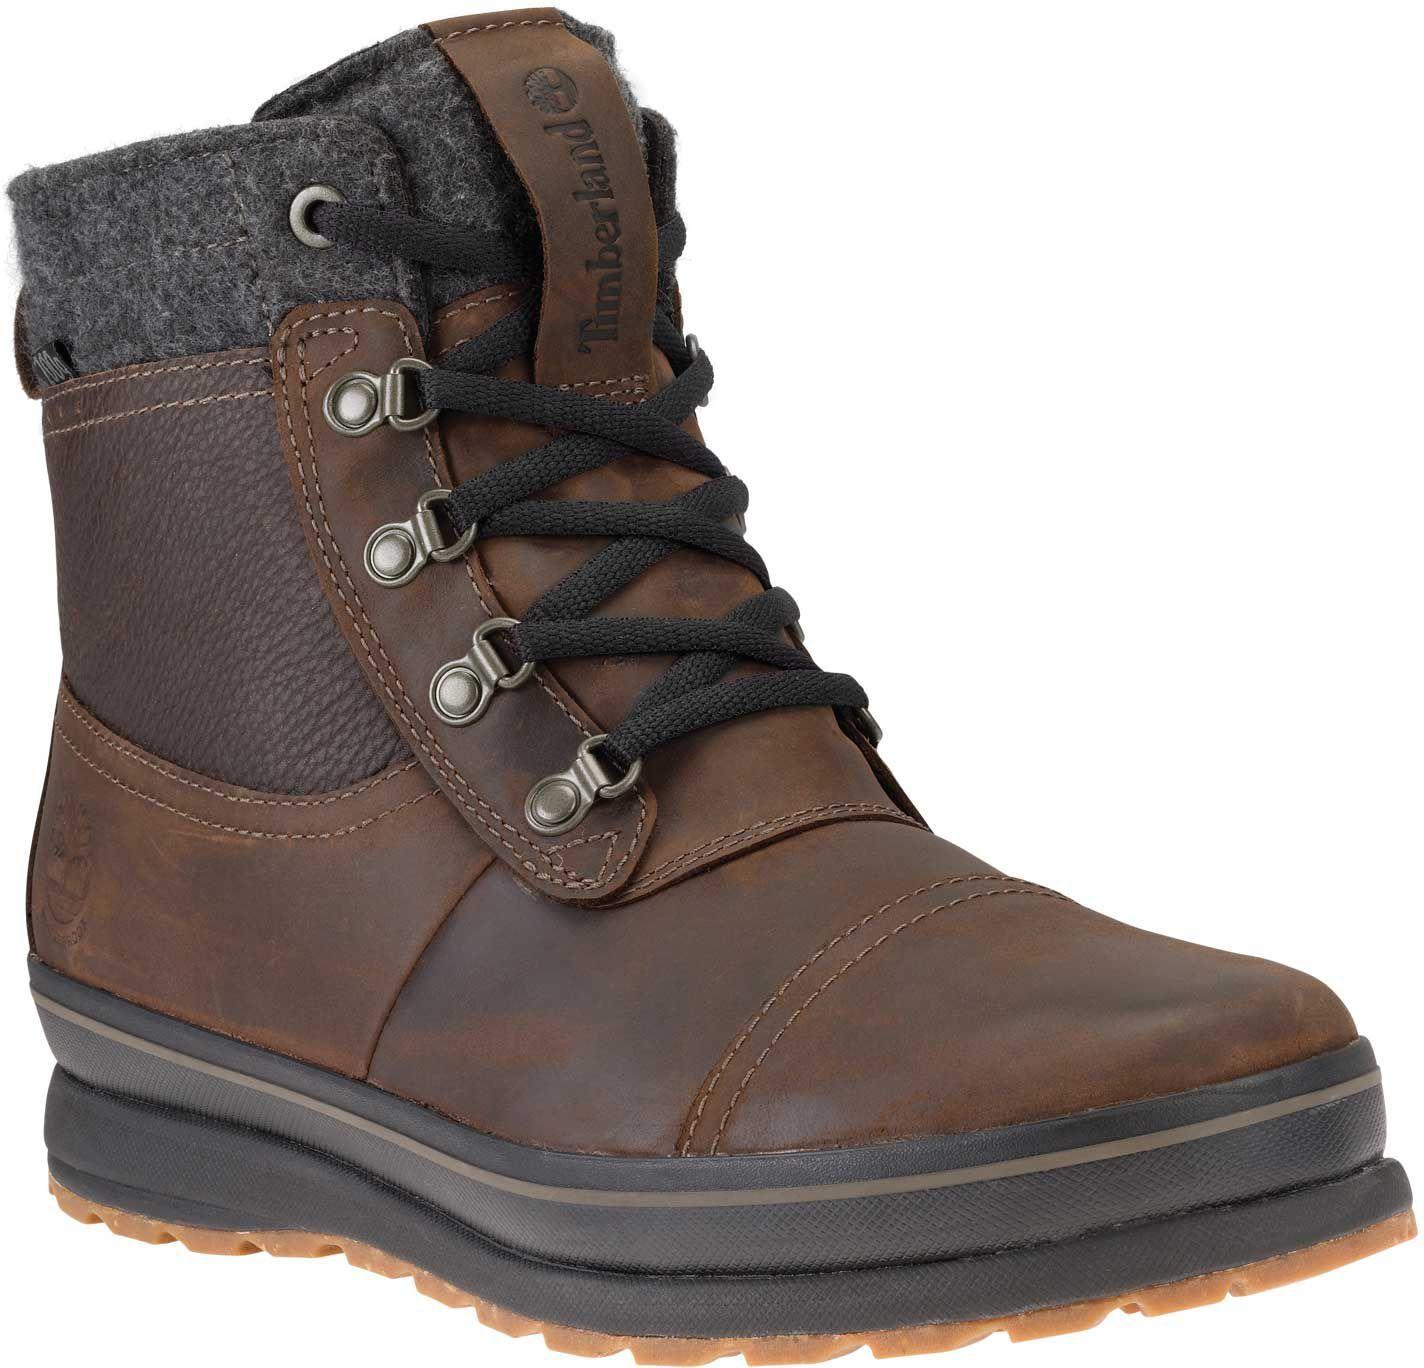 91b9c3651a29 Timberland Men s Schazzberg Mid 200g Waterproof Winter Boots ...